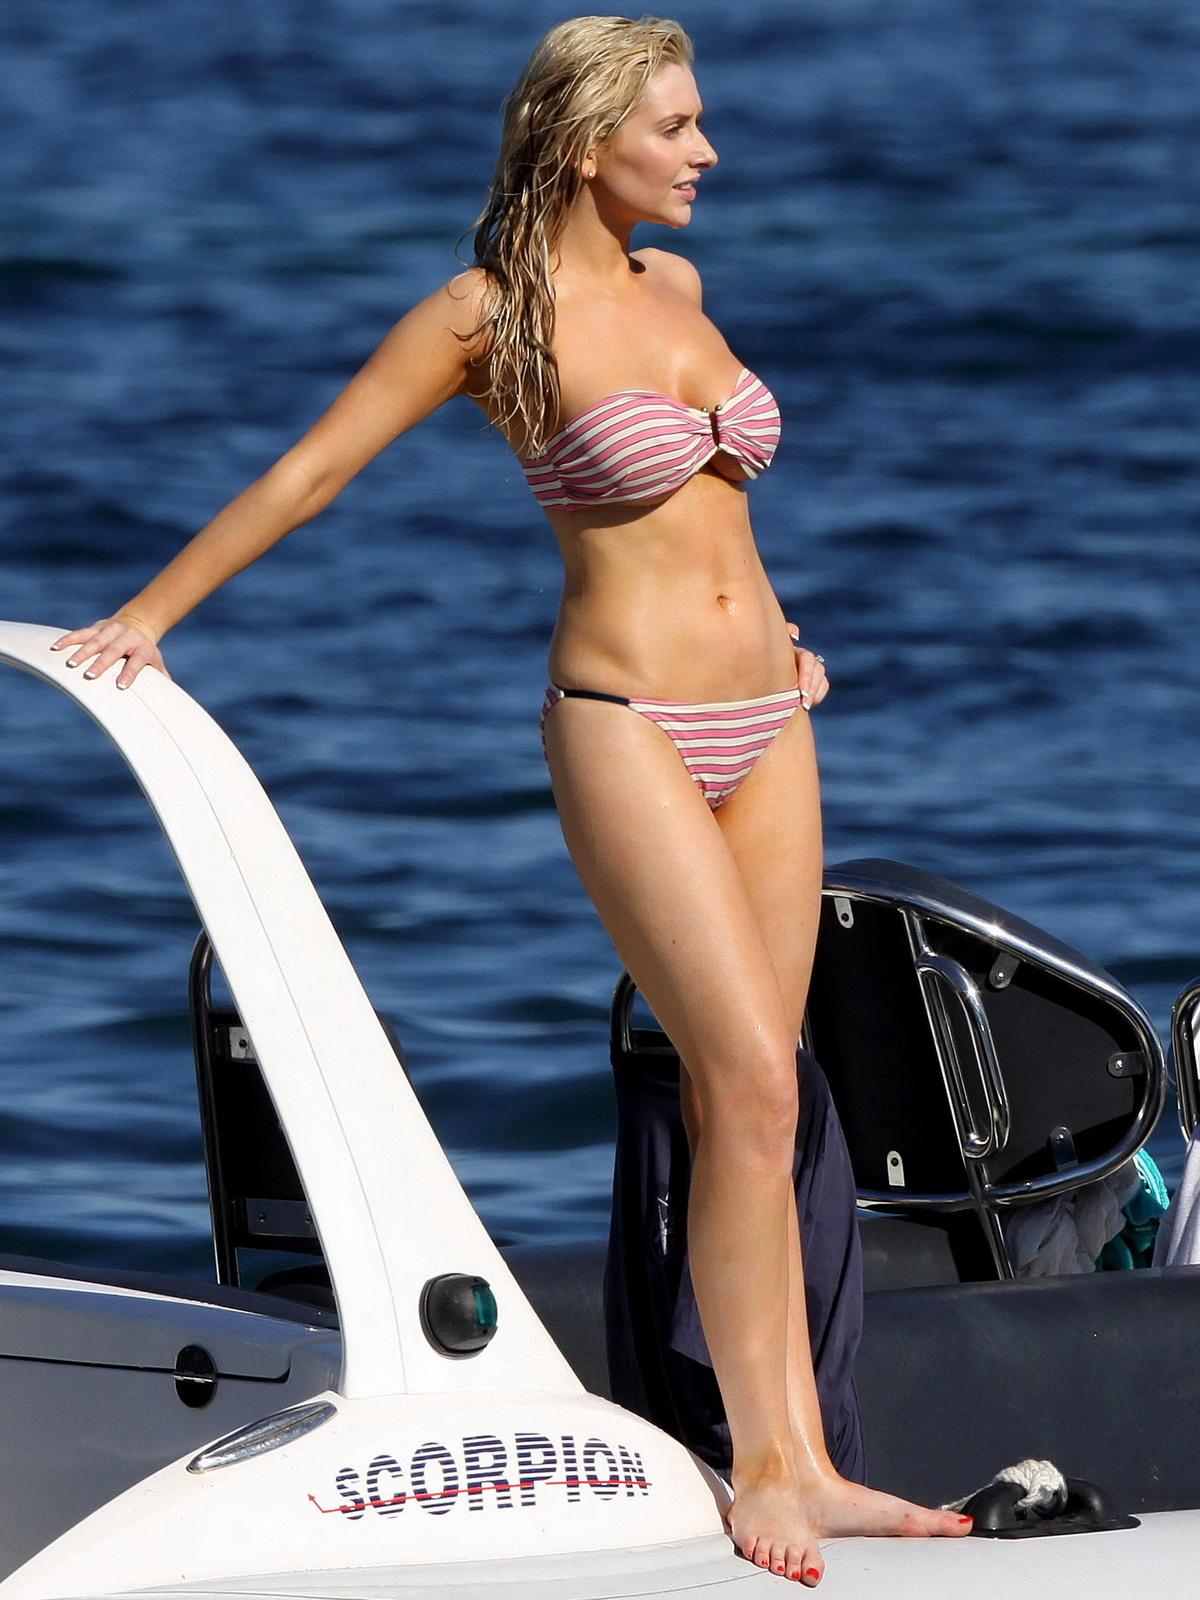 celebritys: Gemma Merna sexy breast and arse in hot bikini